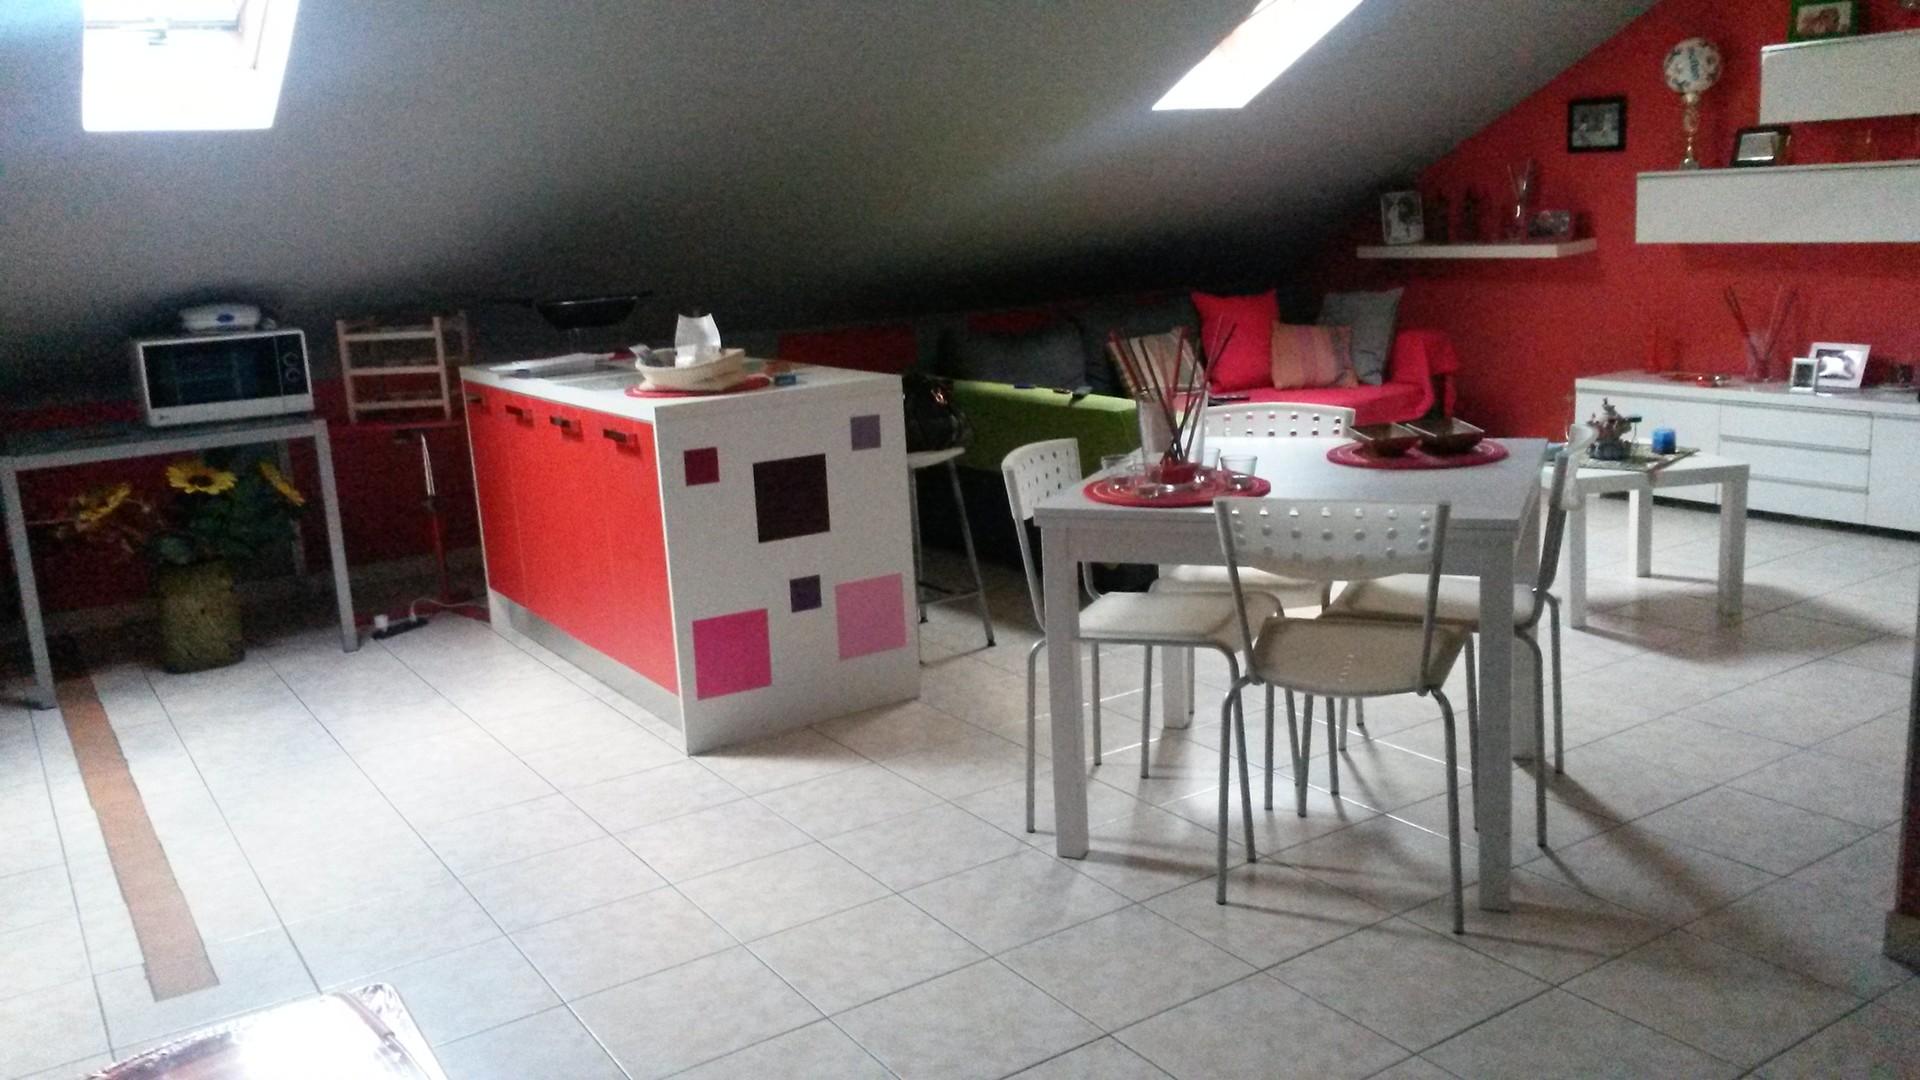 Affitto confortevole mansarda arredata appartamenti in for Appartamenti arredati in affitto torino